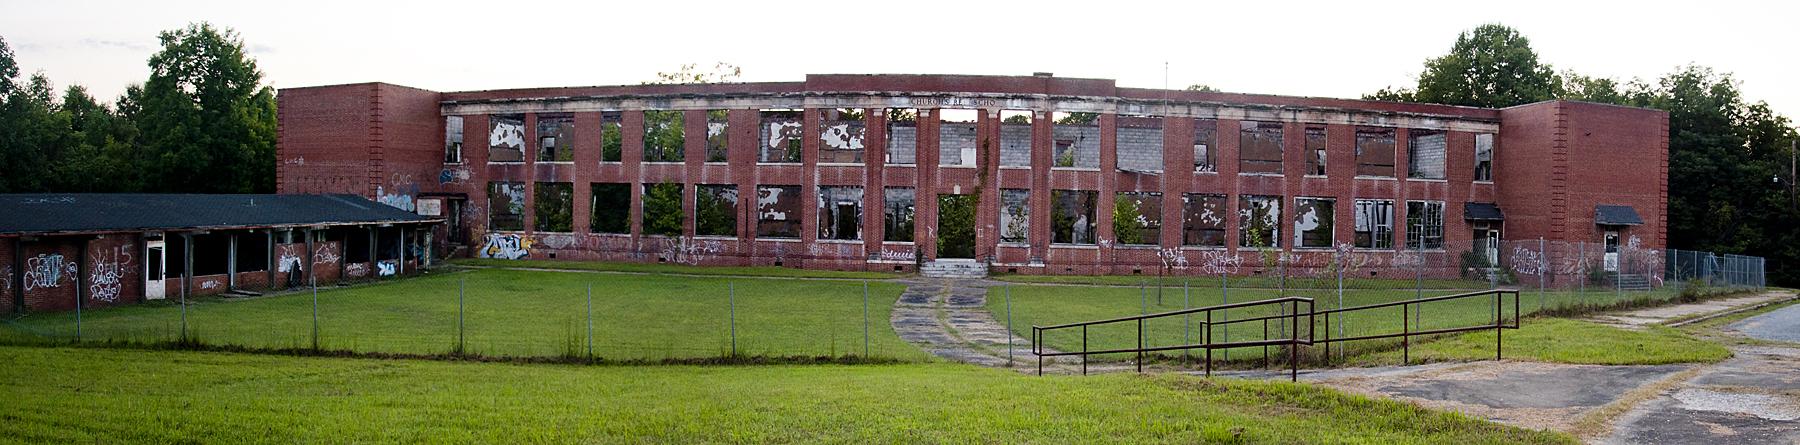 Thomasville (NC) United States  city photos : Description Church Street School Thomasville, NC